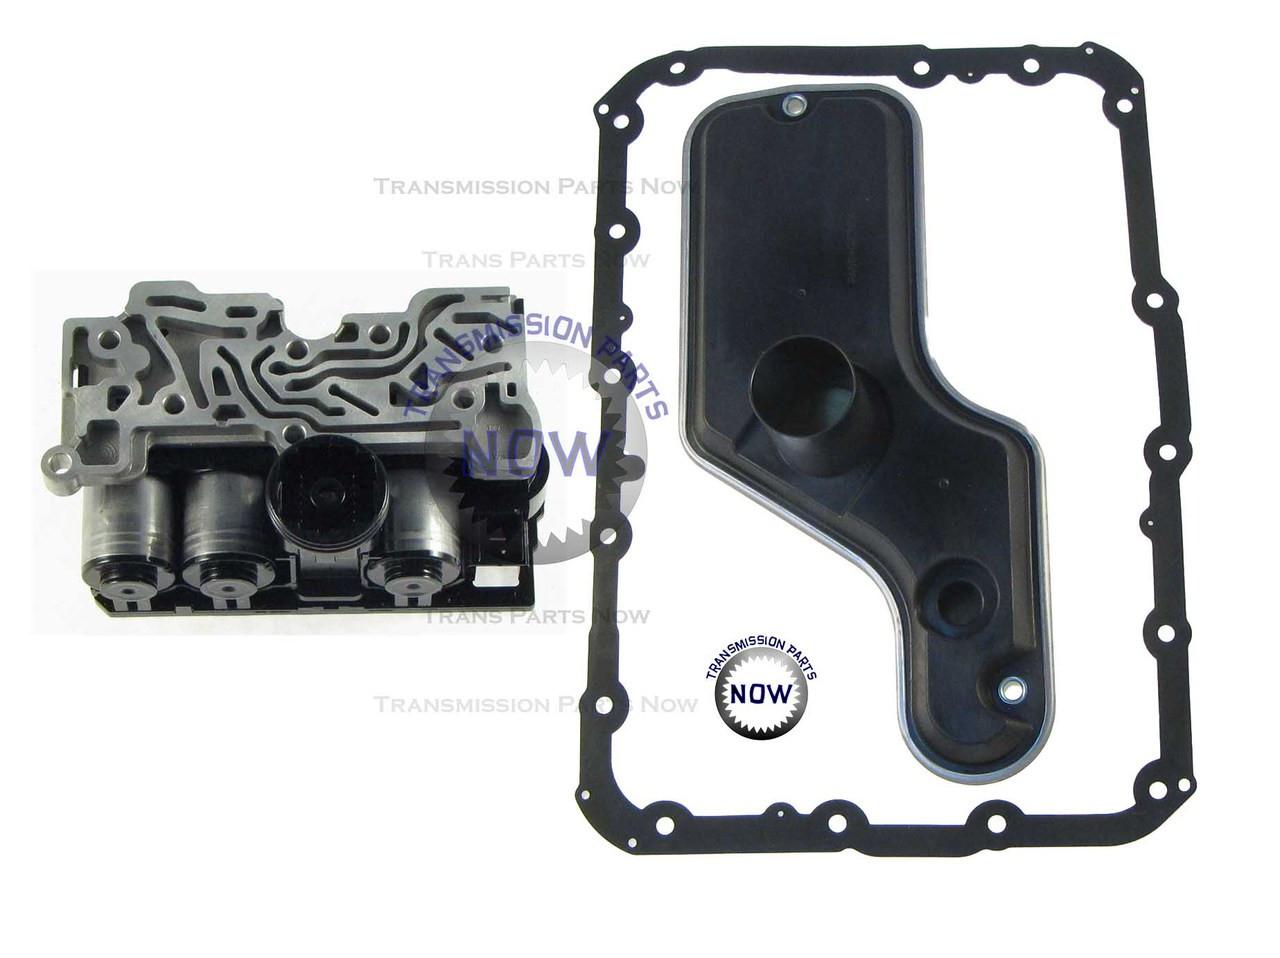 medium resolution of ford 5r55s 5r55w transmission solenoid pack pressure control solenoid shift solenoids